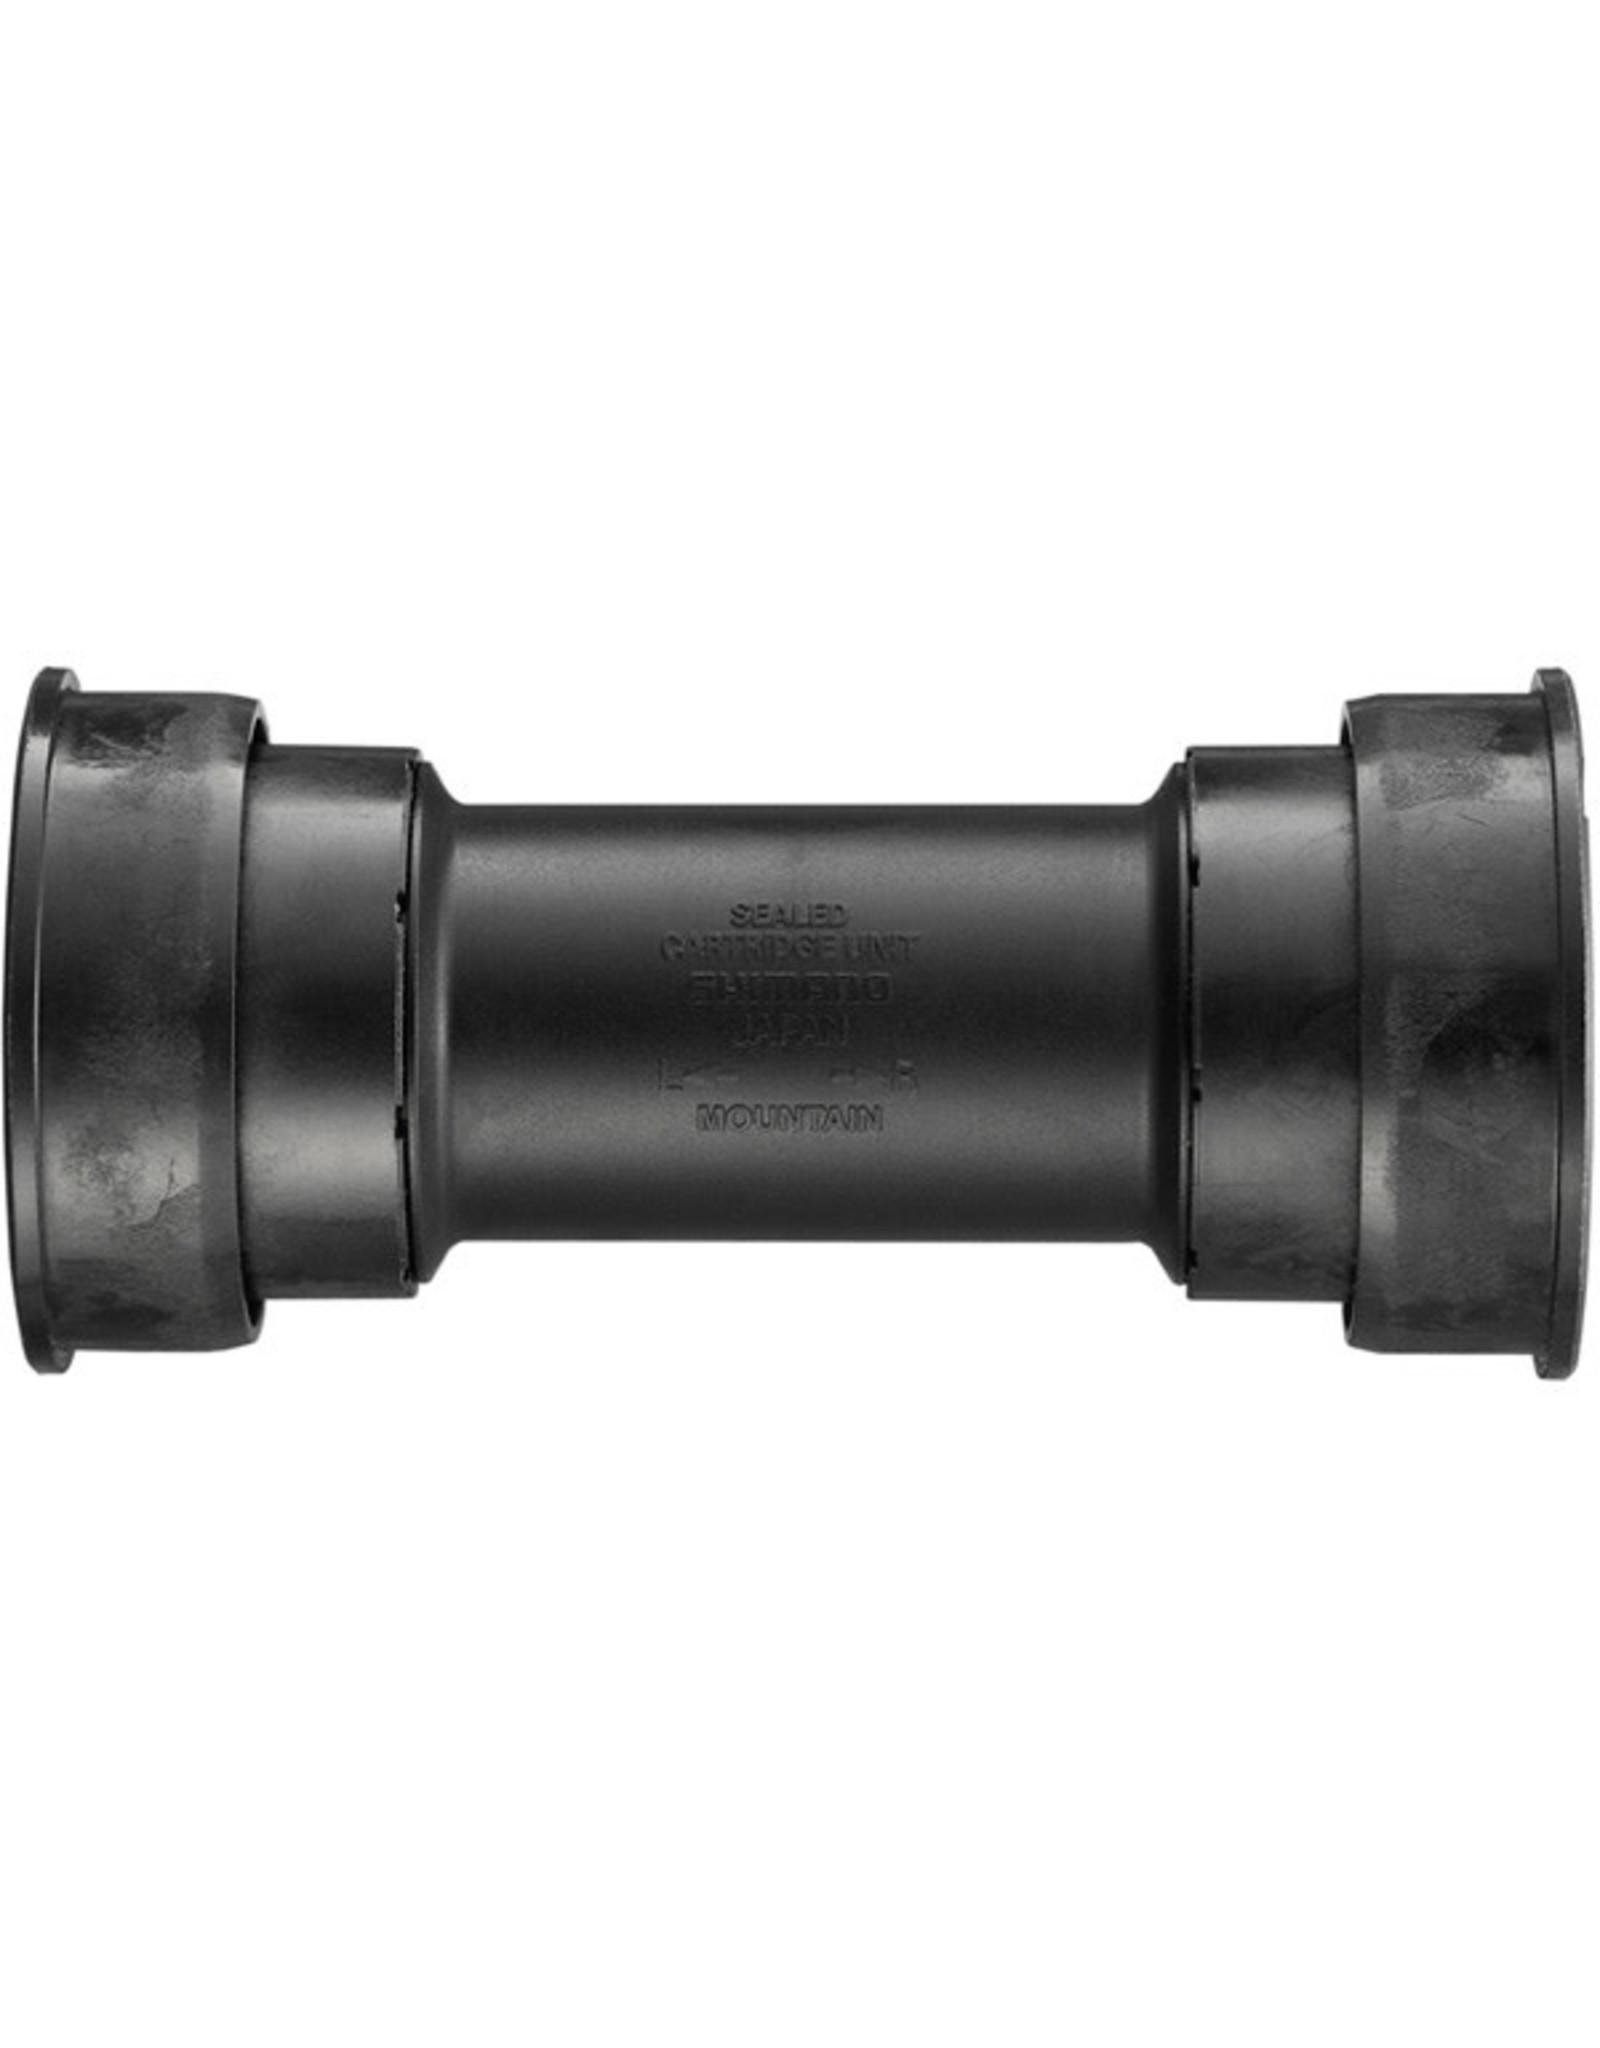 Shimano Bottom Bracket MTB Press Fit BB94 92/89.5 41